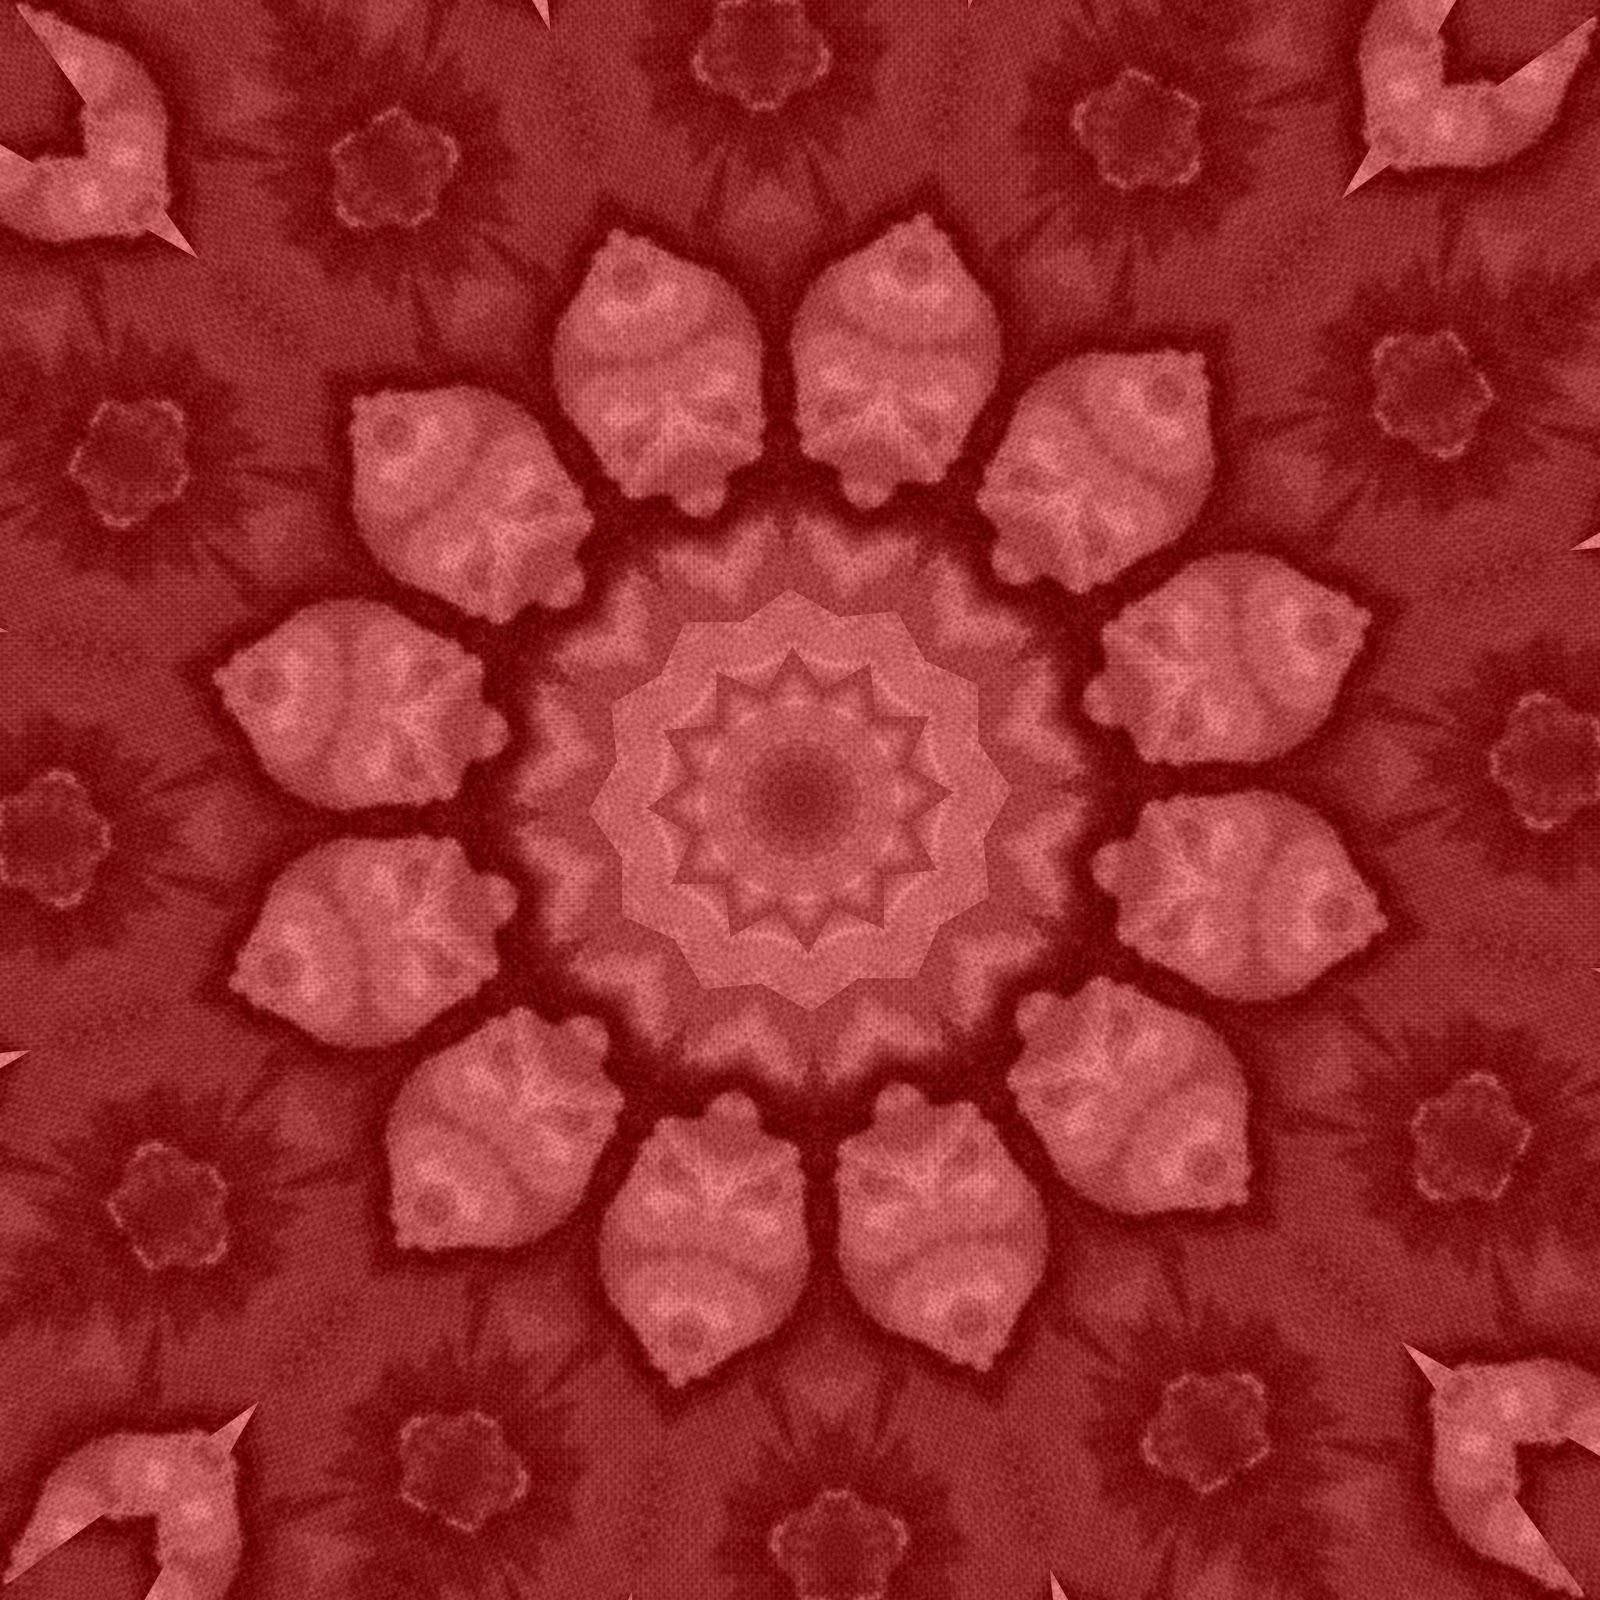 Free download bright red bohemian mandala patterned digital background paper.